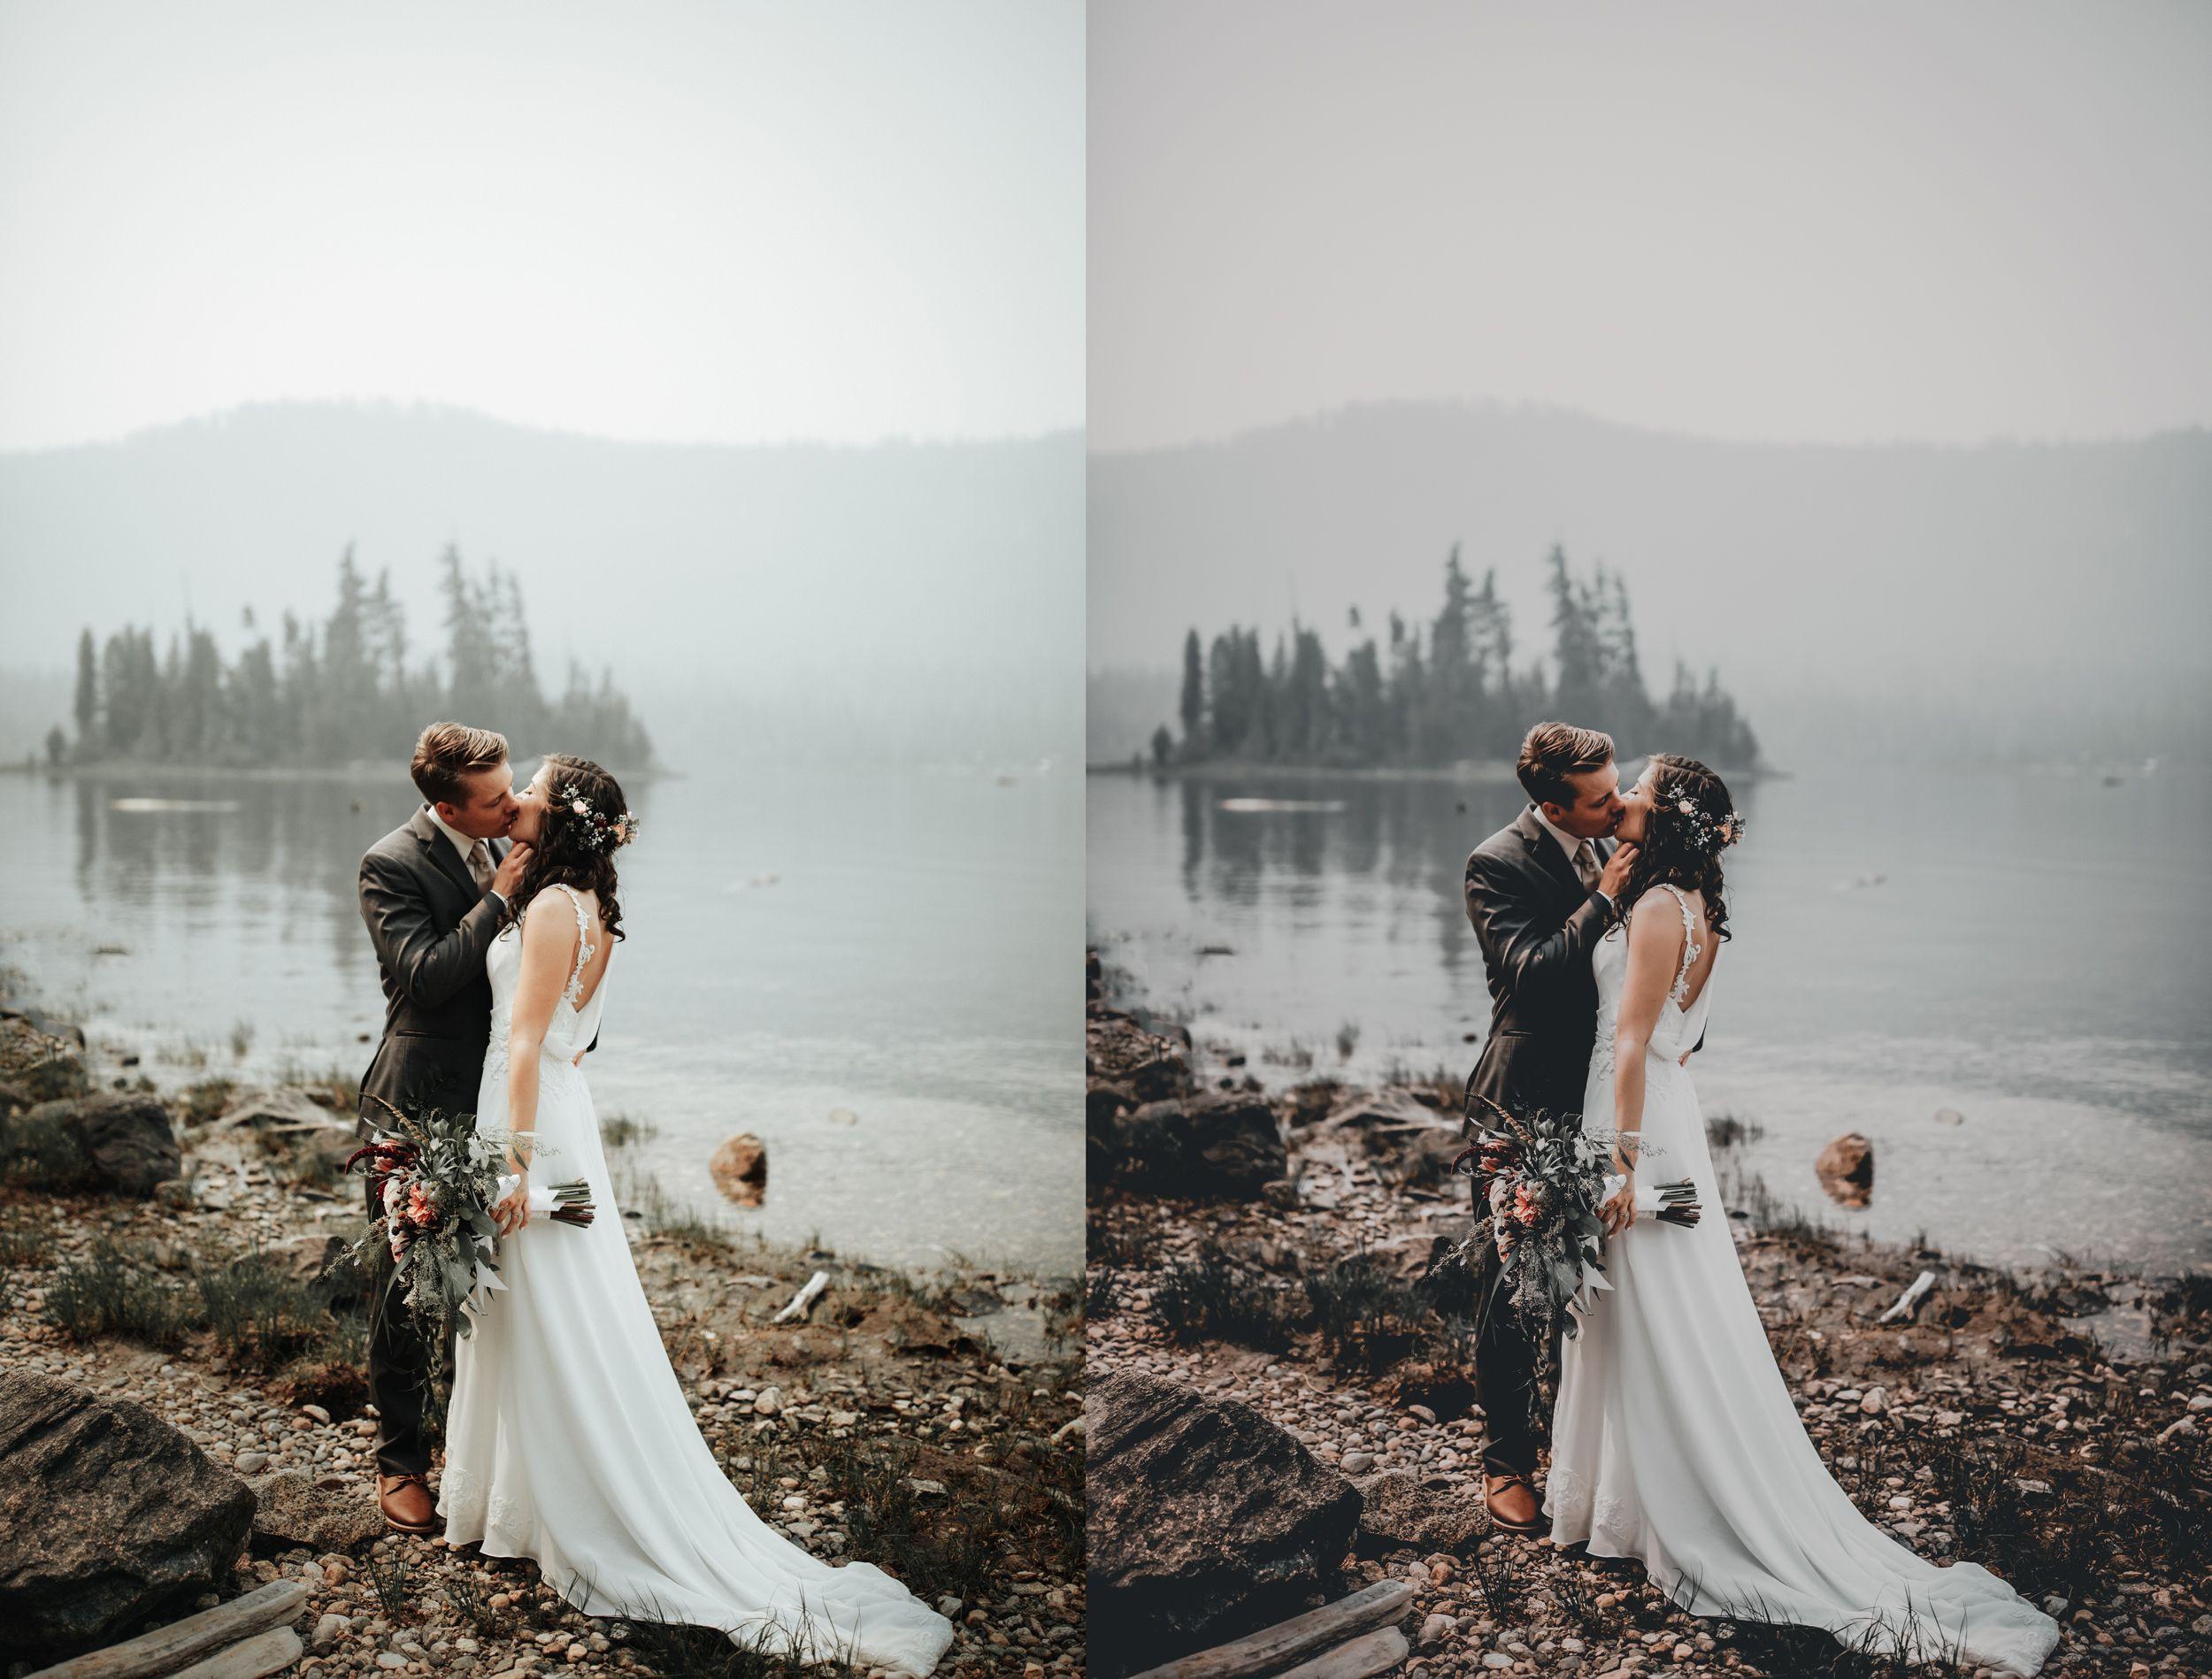 Warm Moody Film Presets Actions Wedding Presets Lightroom Presets Portrait Film Presets Lightroom